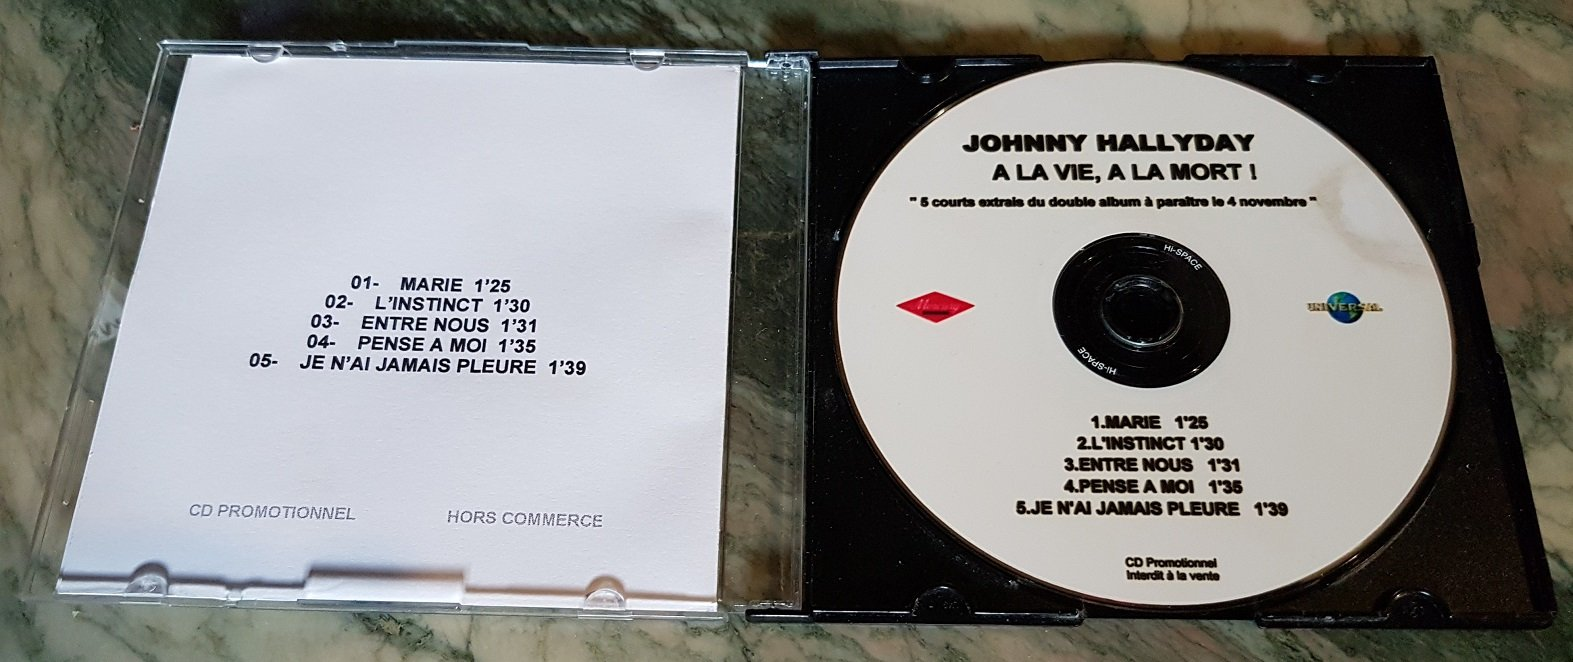 Les cd singles  version Edits - Page 2 201120042507164257